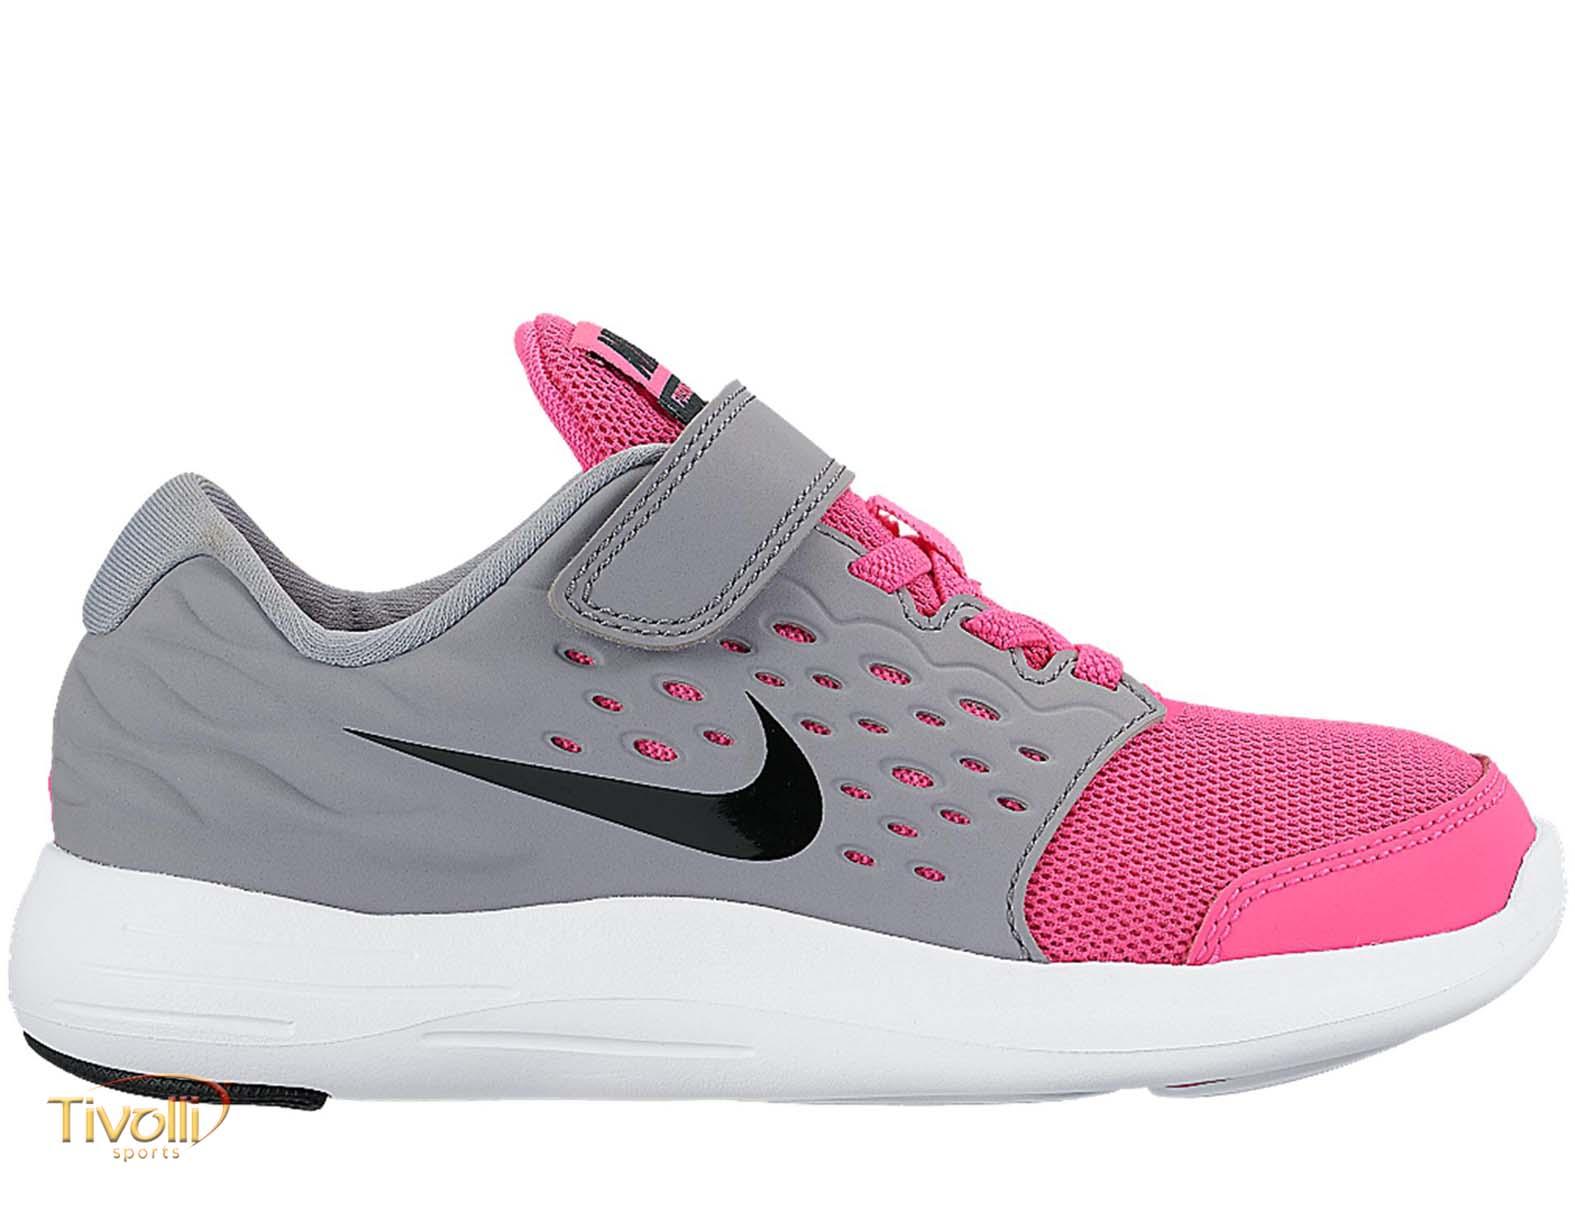 Tênis Nike Lunarstelos Psv Infantil Rosa Cinza E Branco